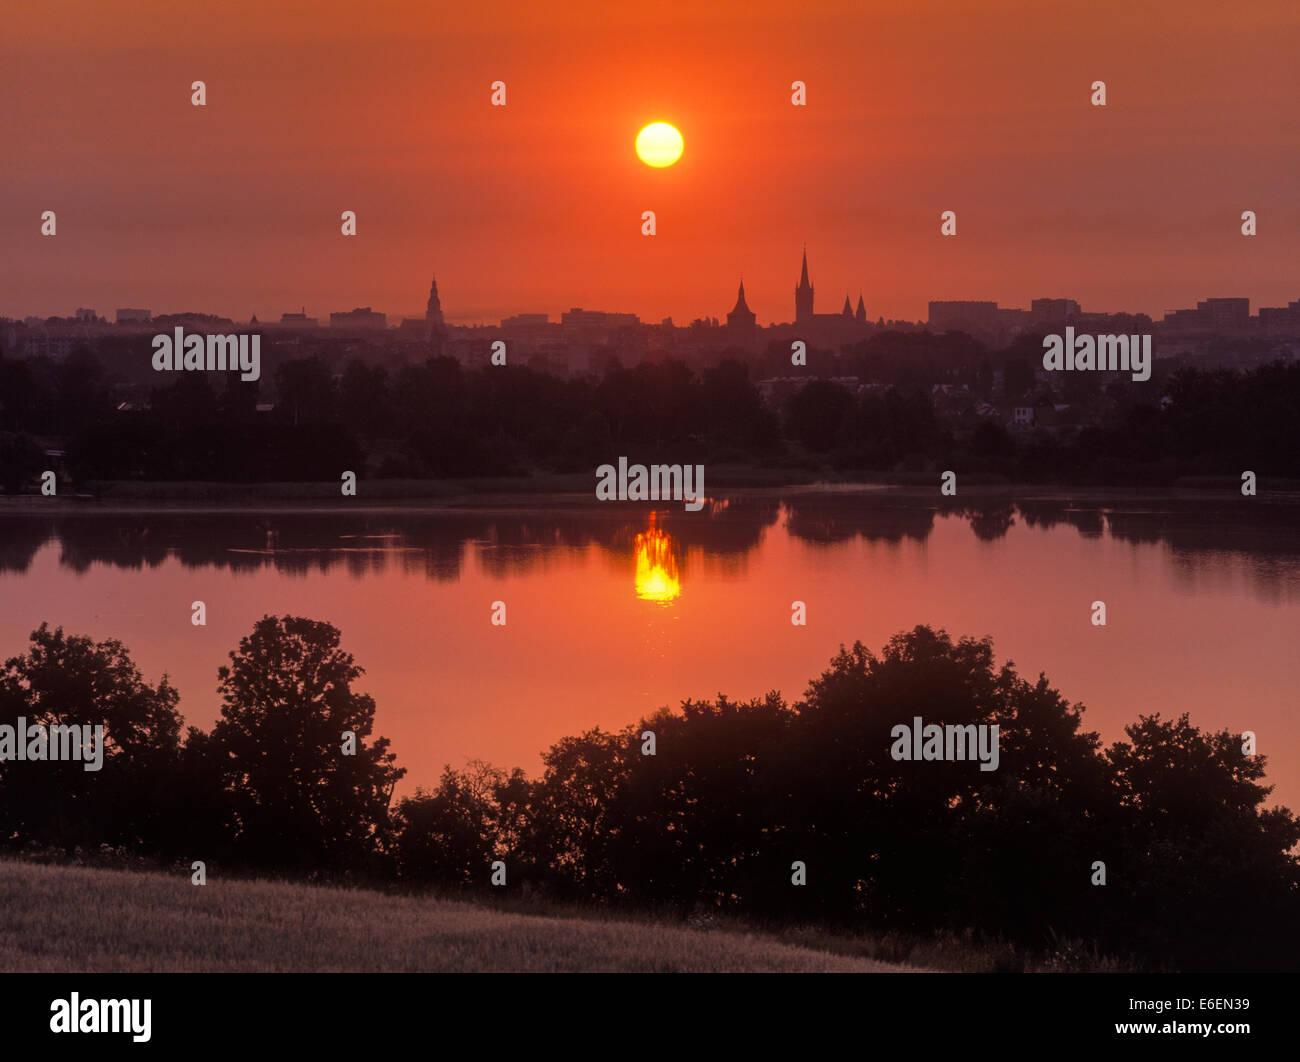 Olsztyn panorama from behind lake, Poland - Stock Image